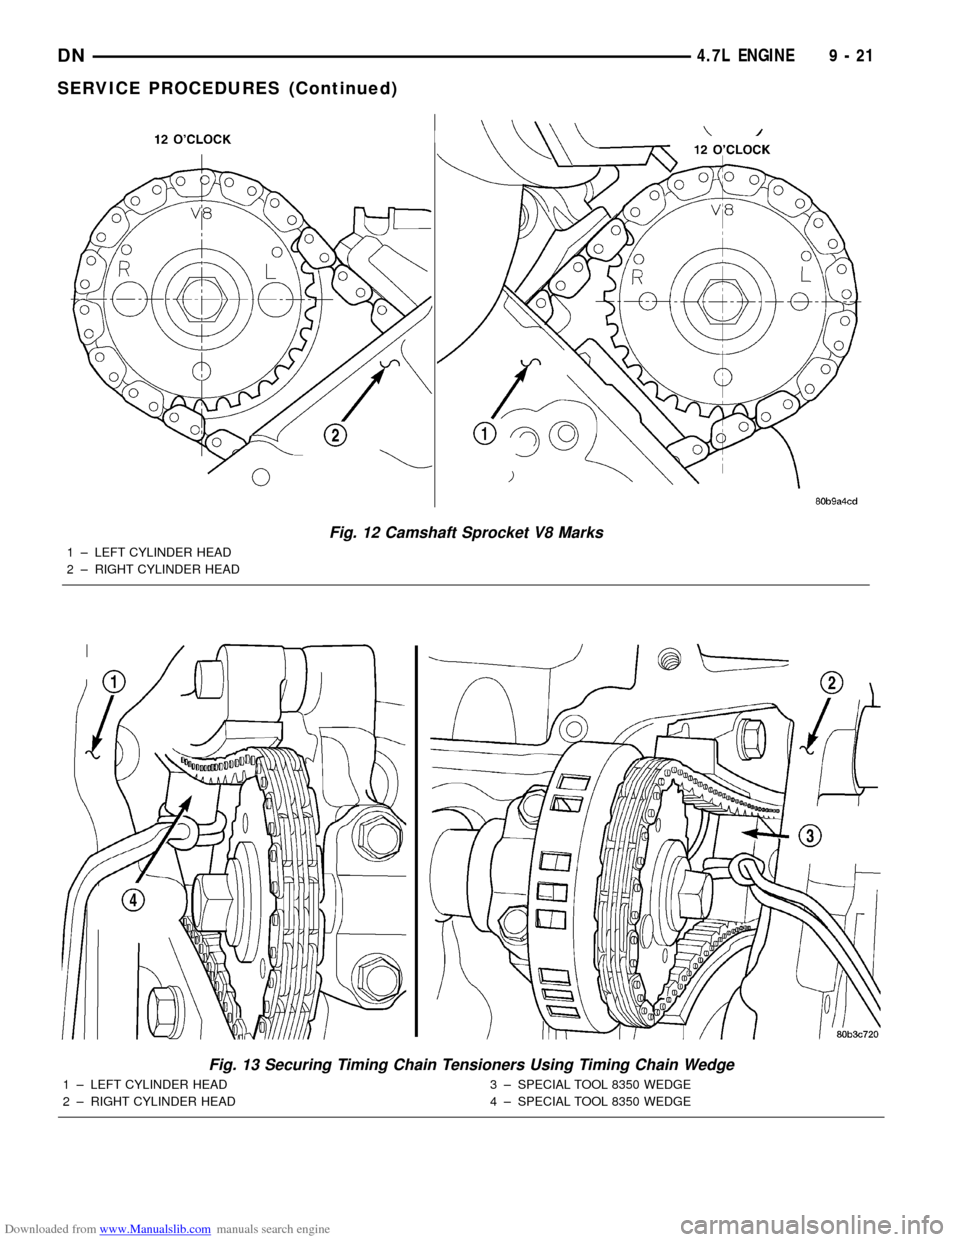 Dodge Durango Exhaust Diagram